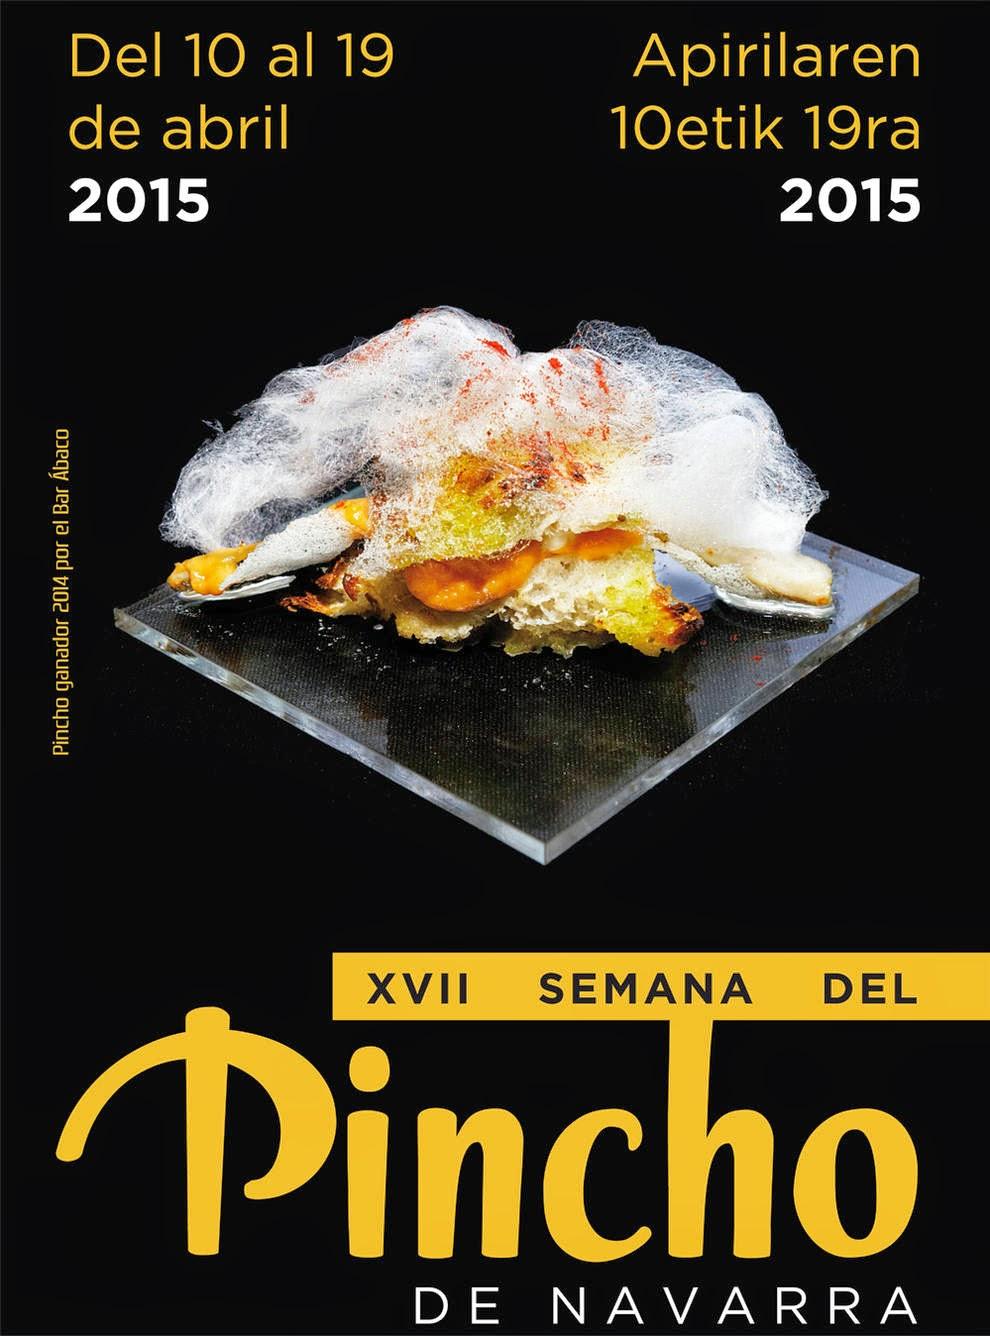 Semana del Pincho en Navarra